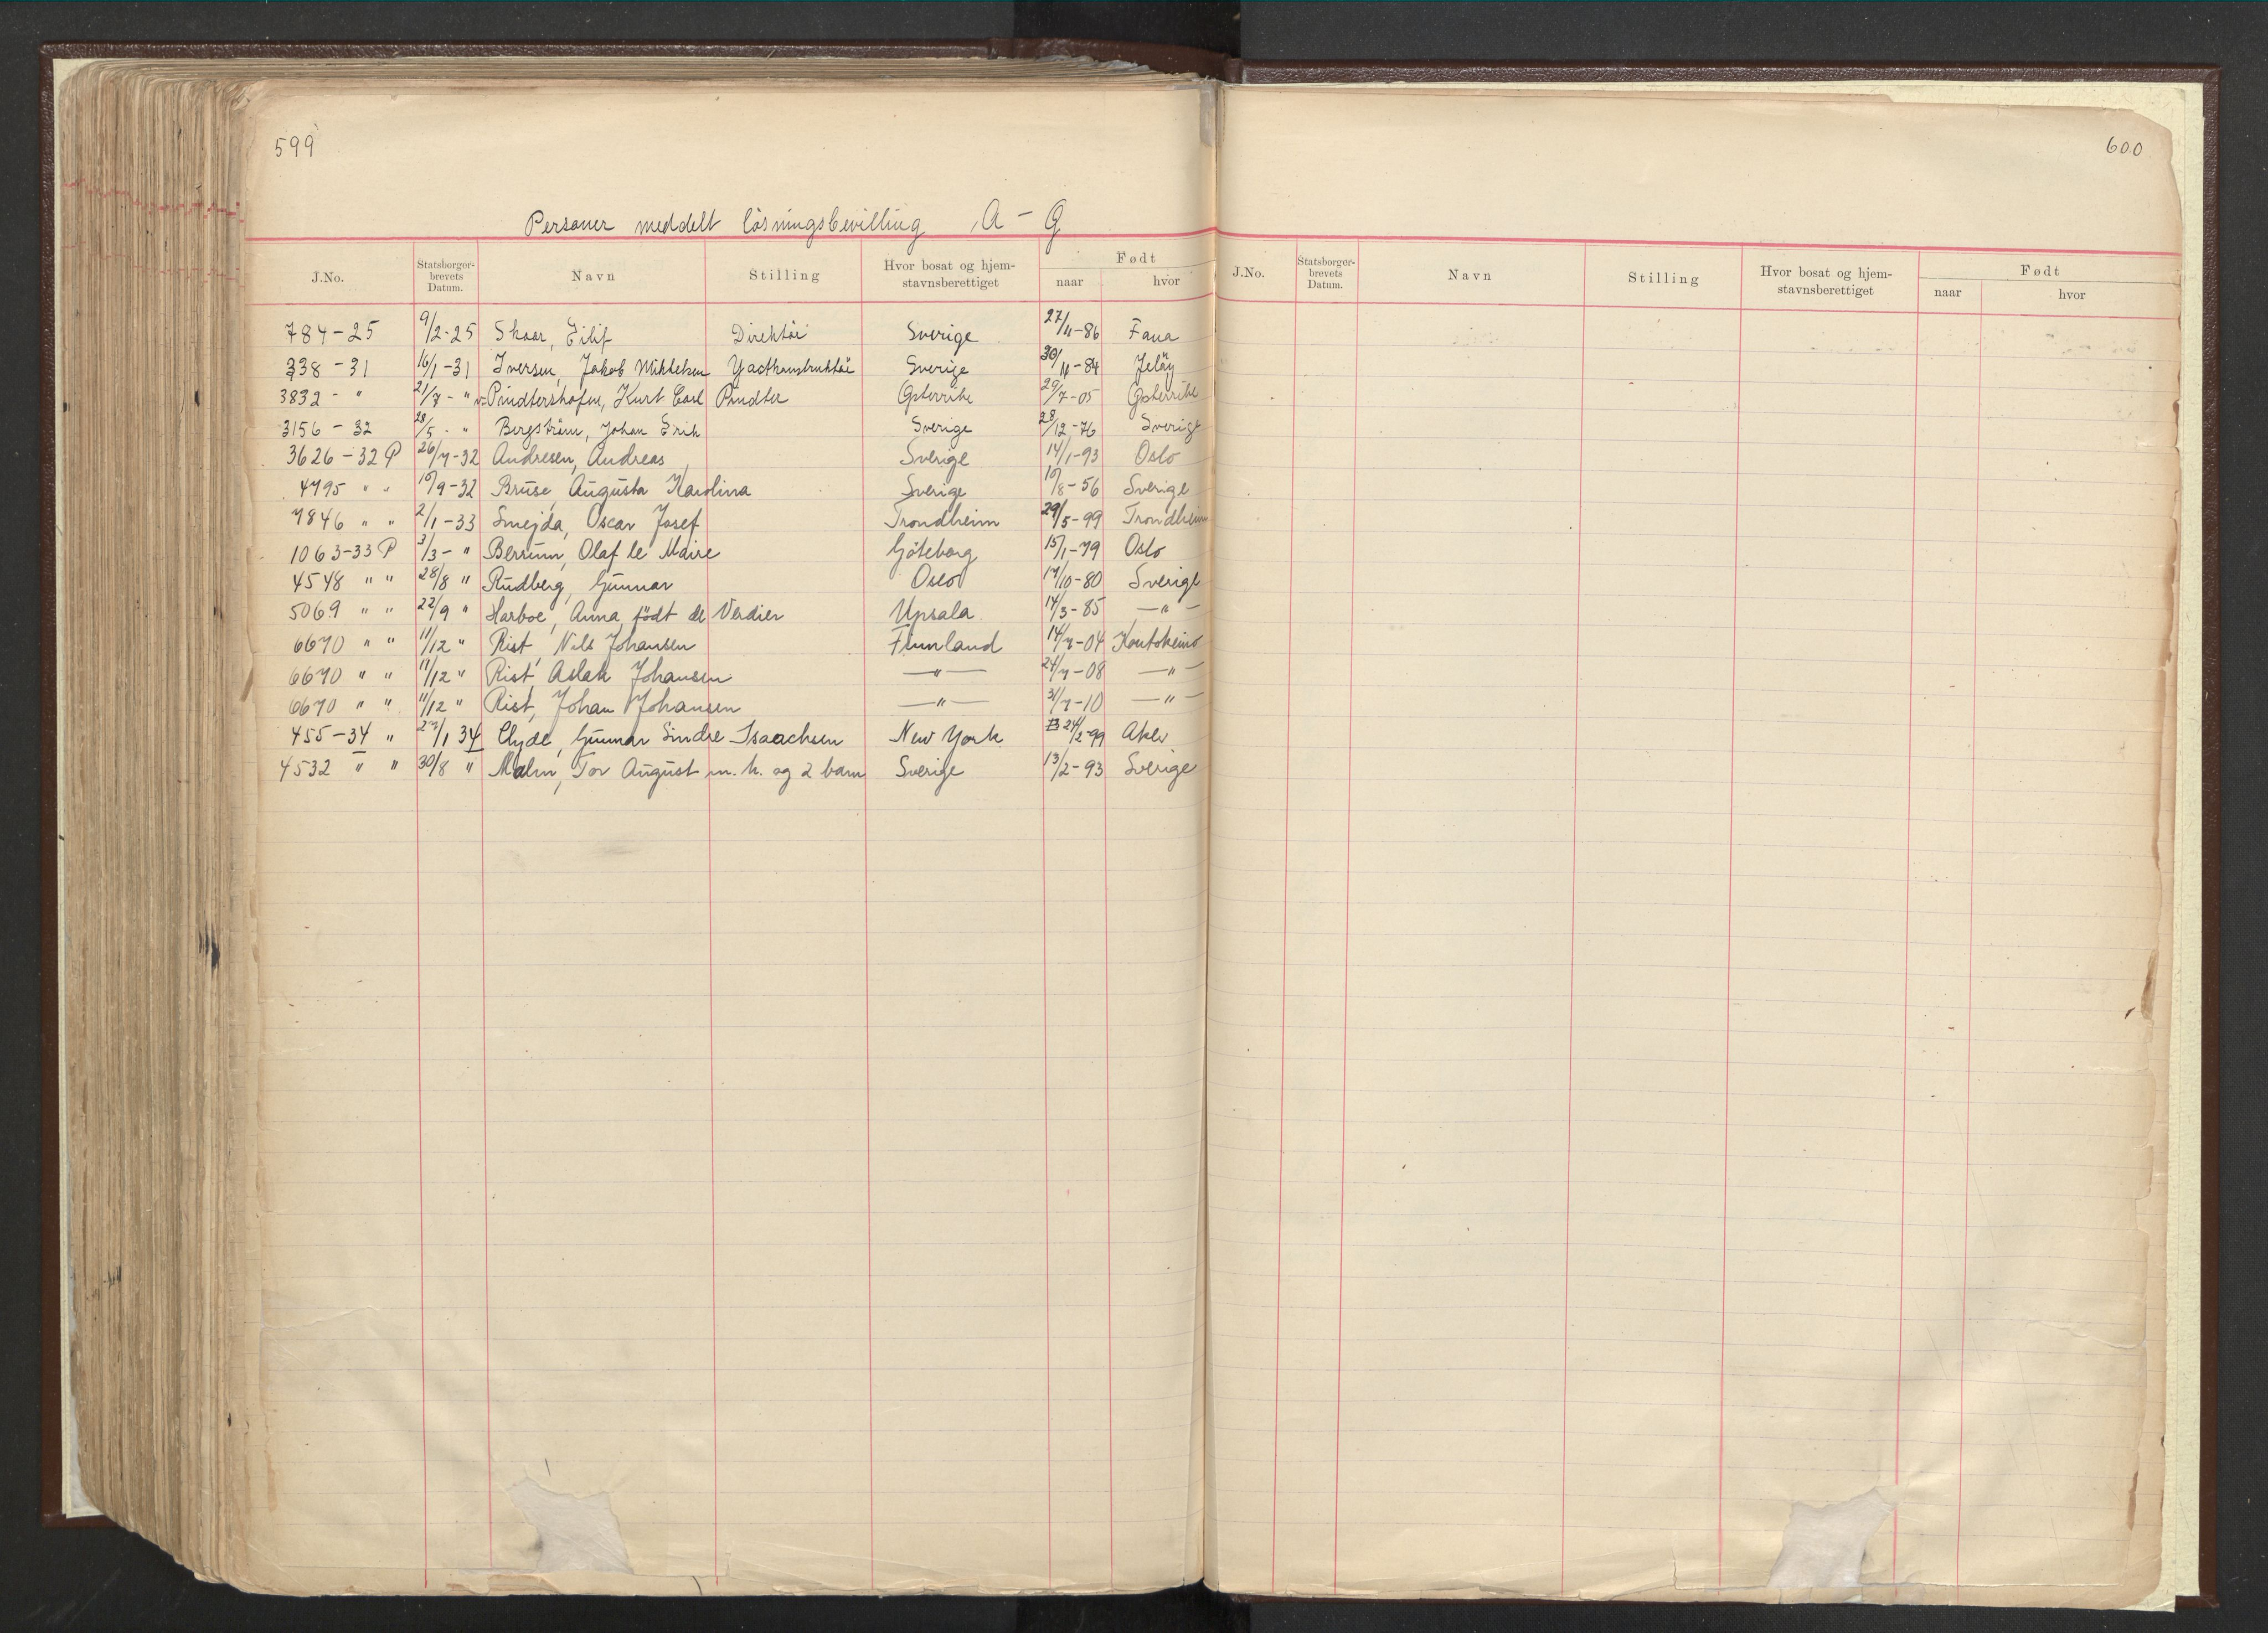 RA, Justisdepartementet, 3. politikontor P3, C/Cc/L0001: Journal over statsborgersaker, 1891-1946, s. 599-600